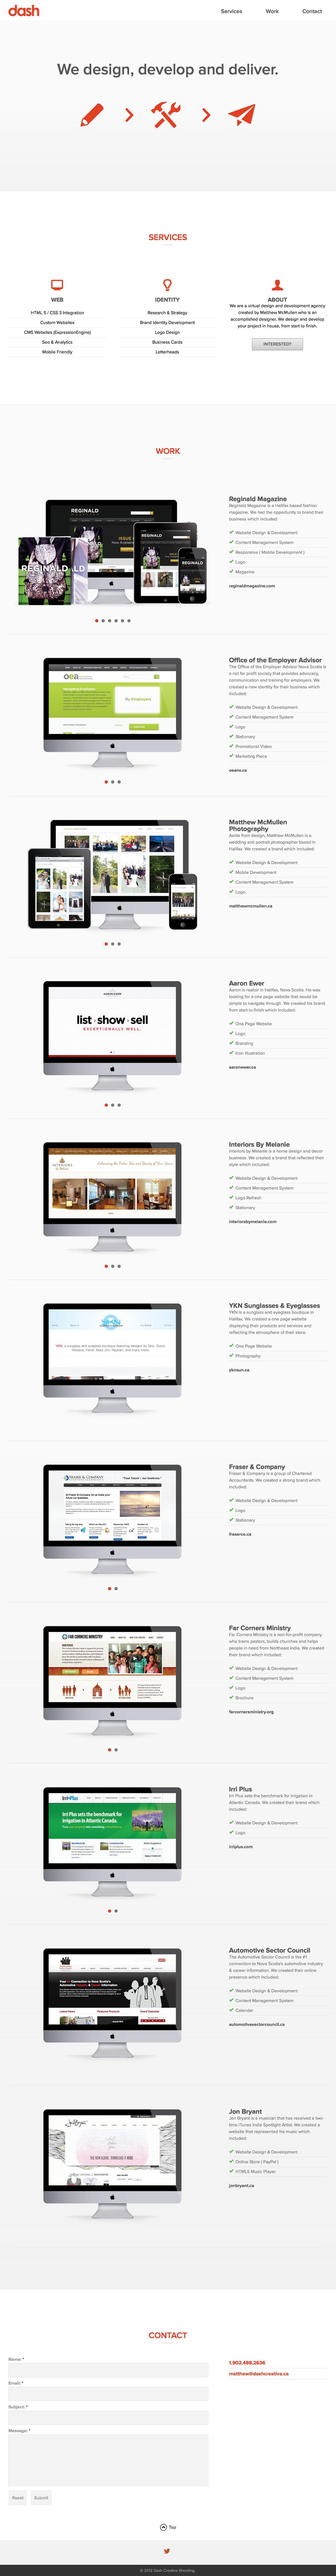 Dash – Creative Branding Website Screenshot